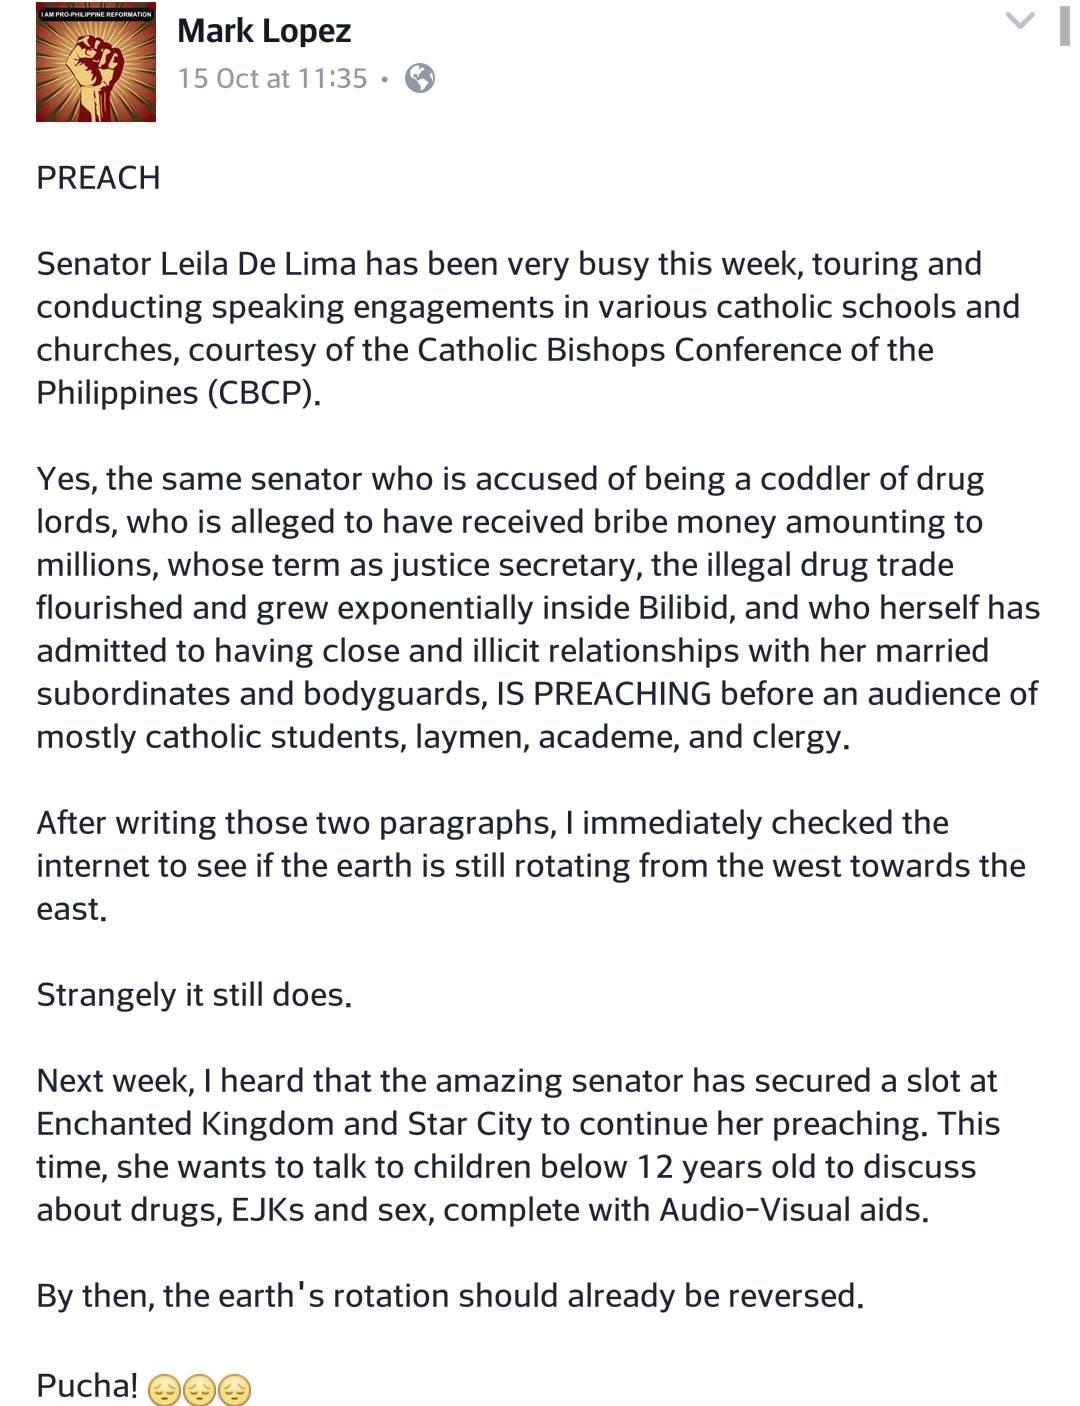 De Lima now a religious preacher?